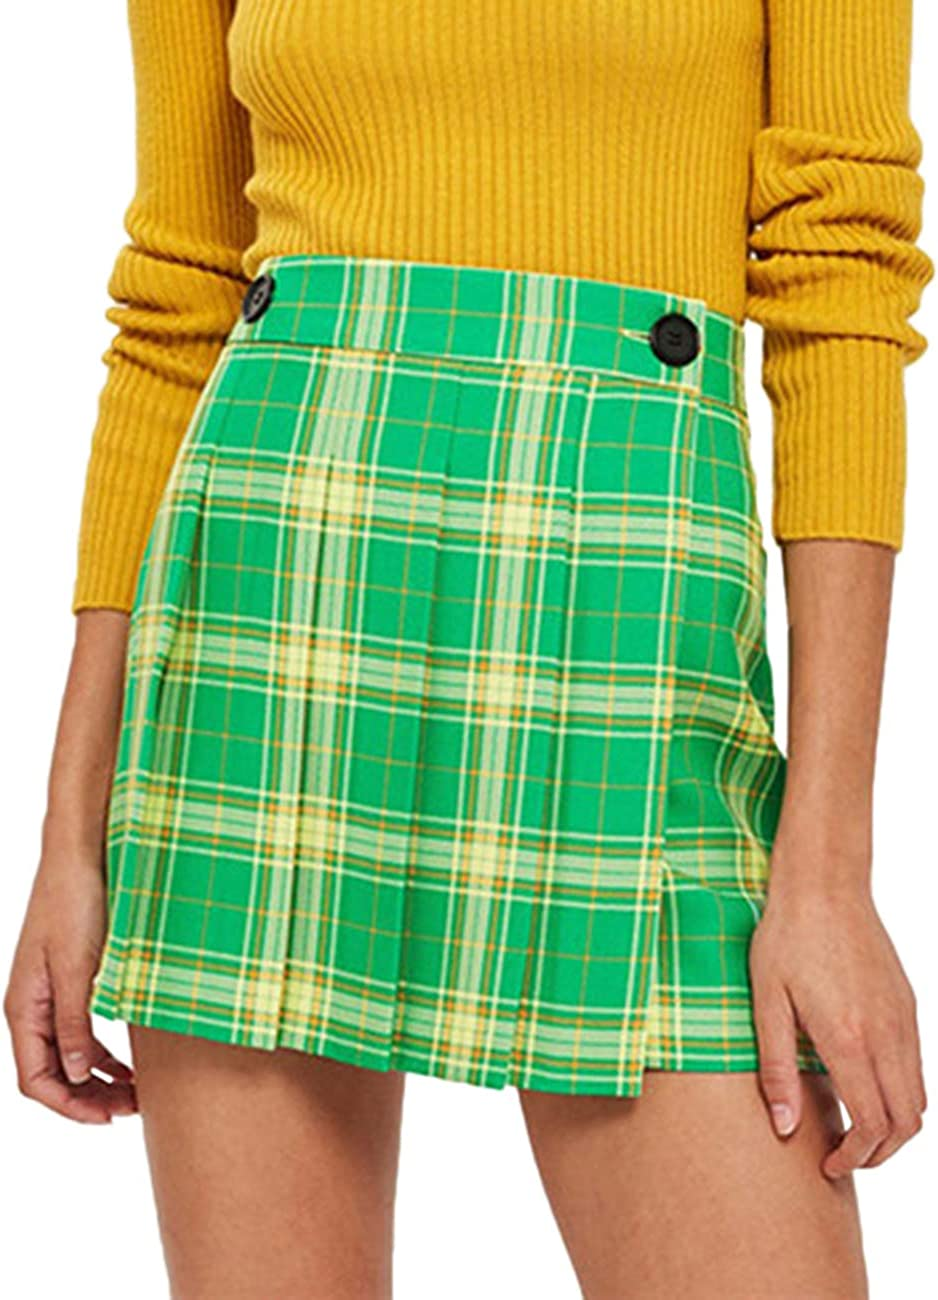 SEMATOMALA Women's High Waist Pleated A Line Mini Skirt School Girl Casual Plaid Button Closure Uniform Skirt